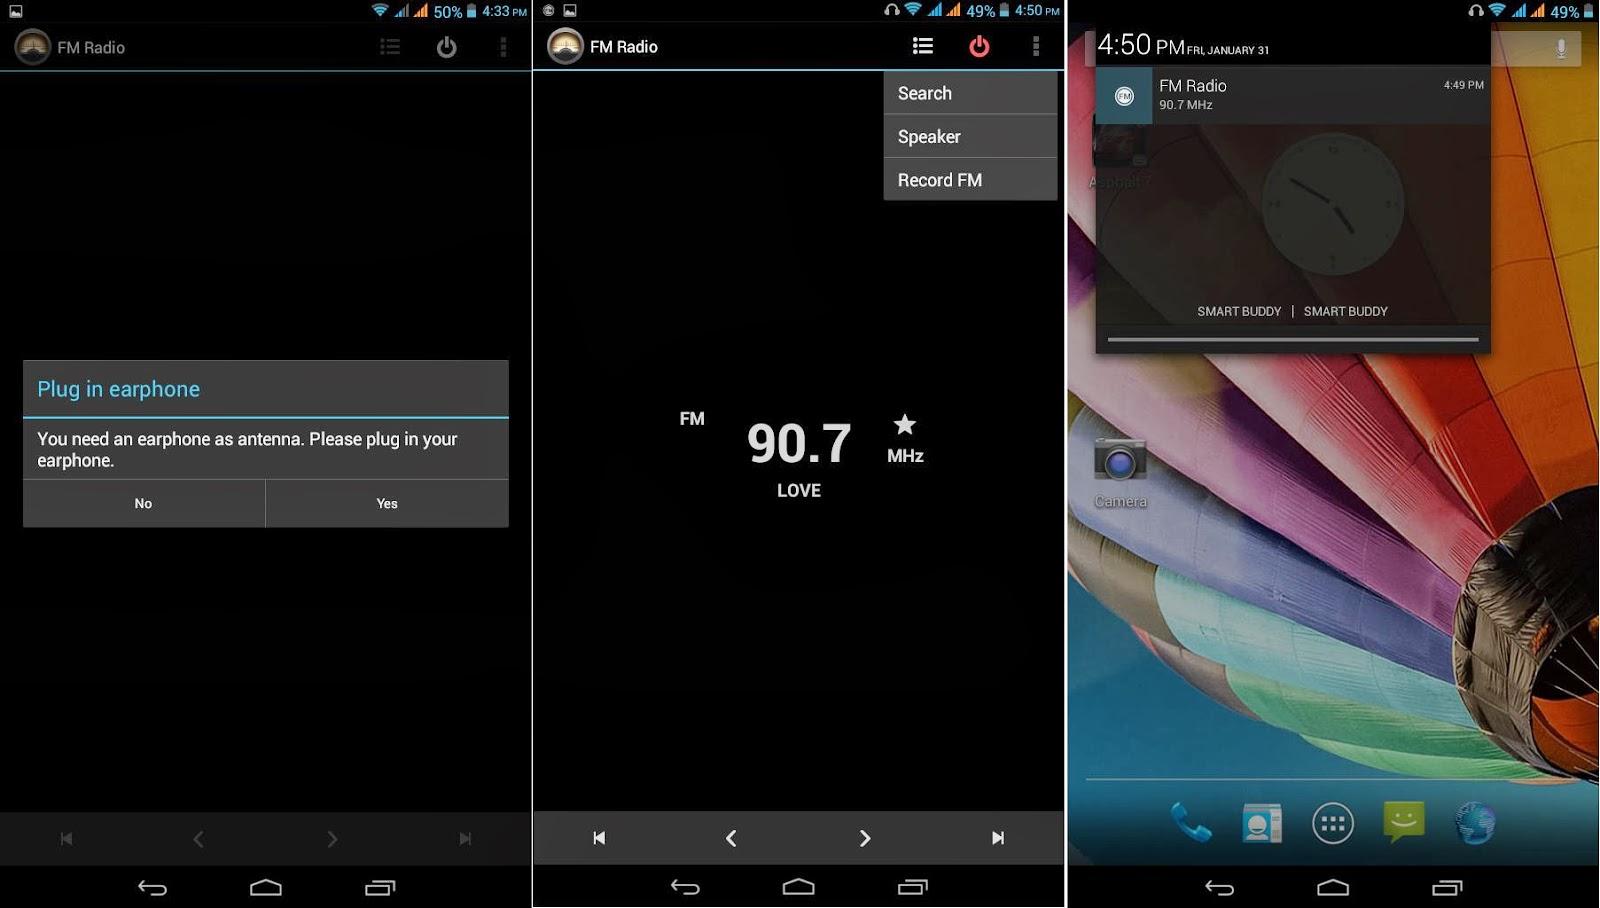 SKK Mobile Cyclops II FM Radio